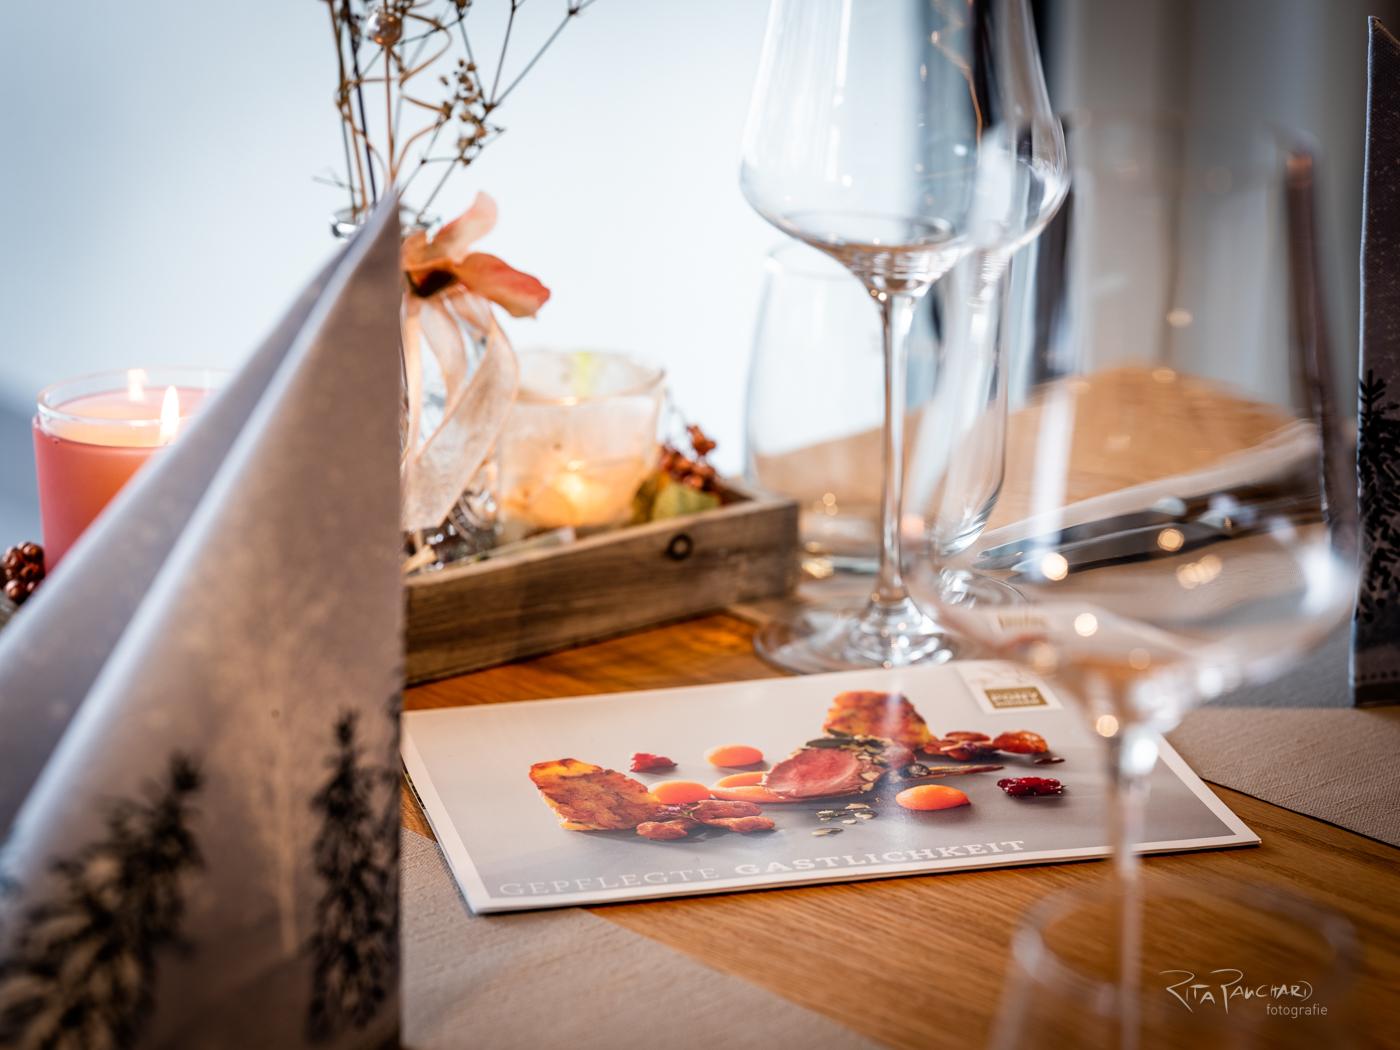 restaurantfotografie_gastrofotografie-5063.jpg